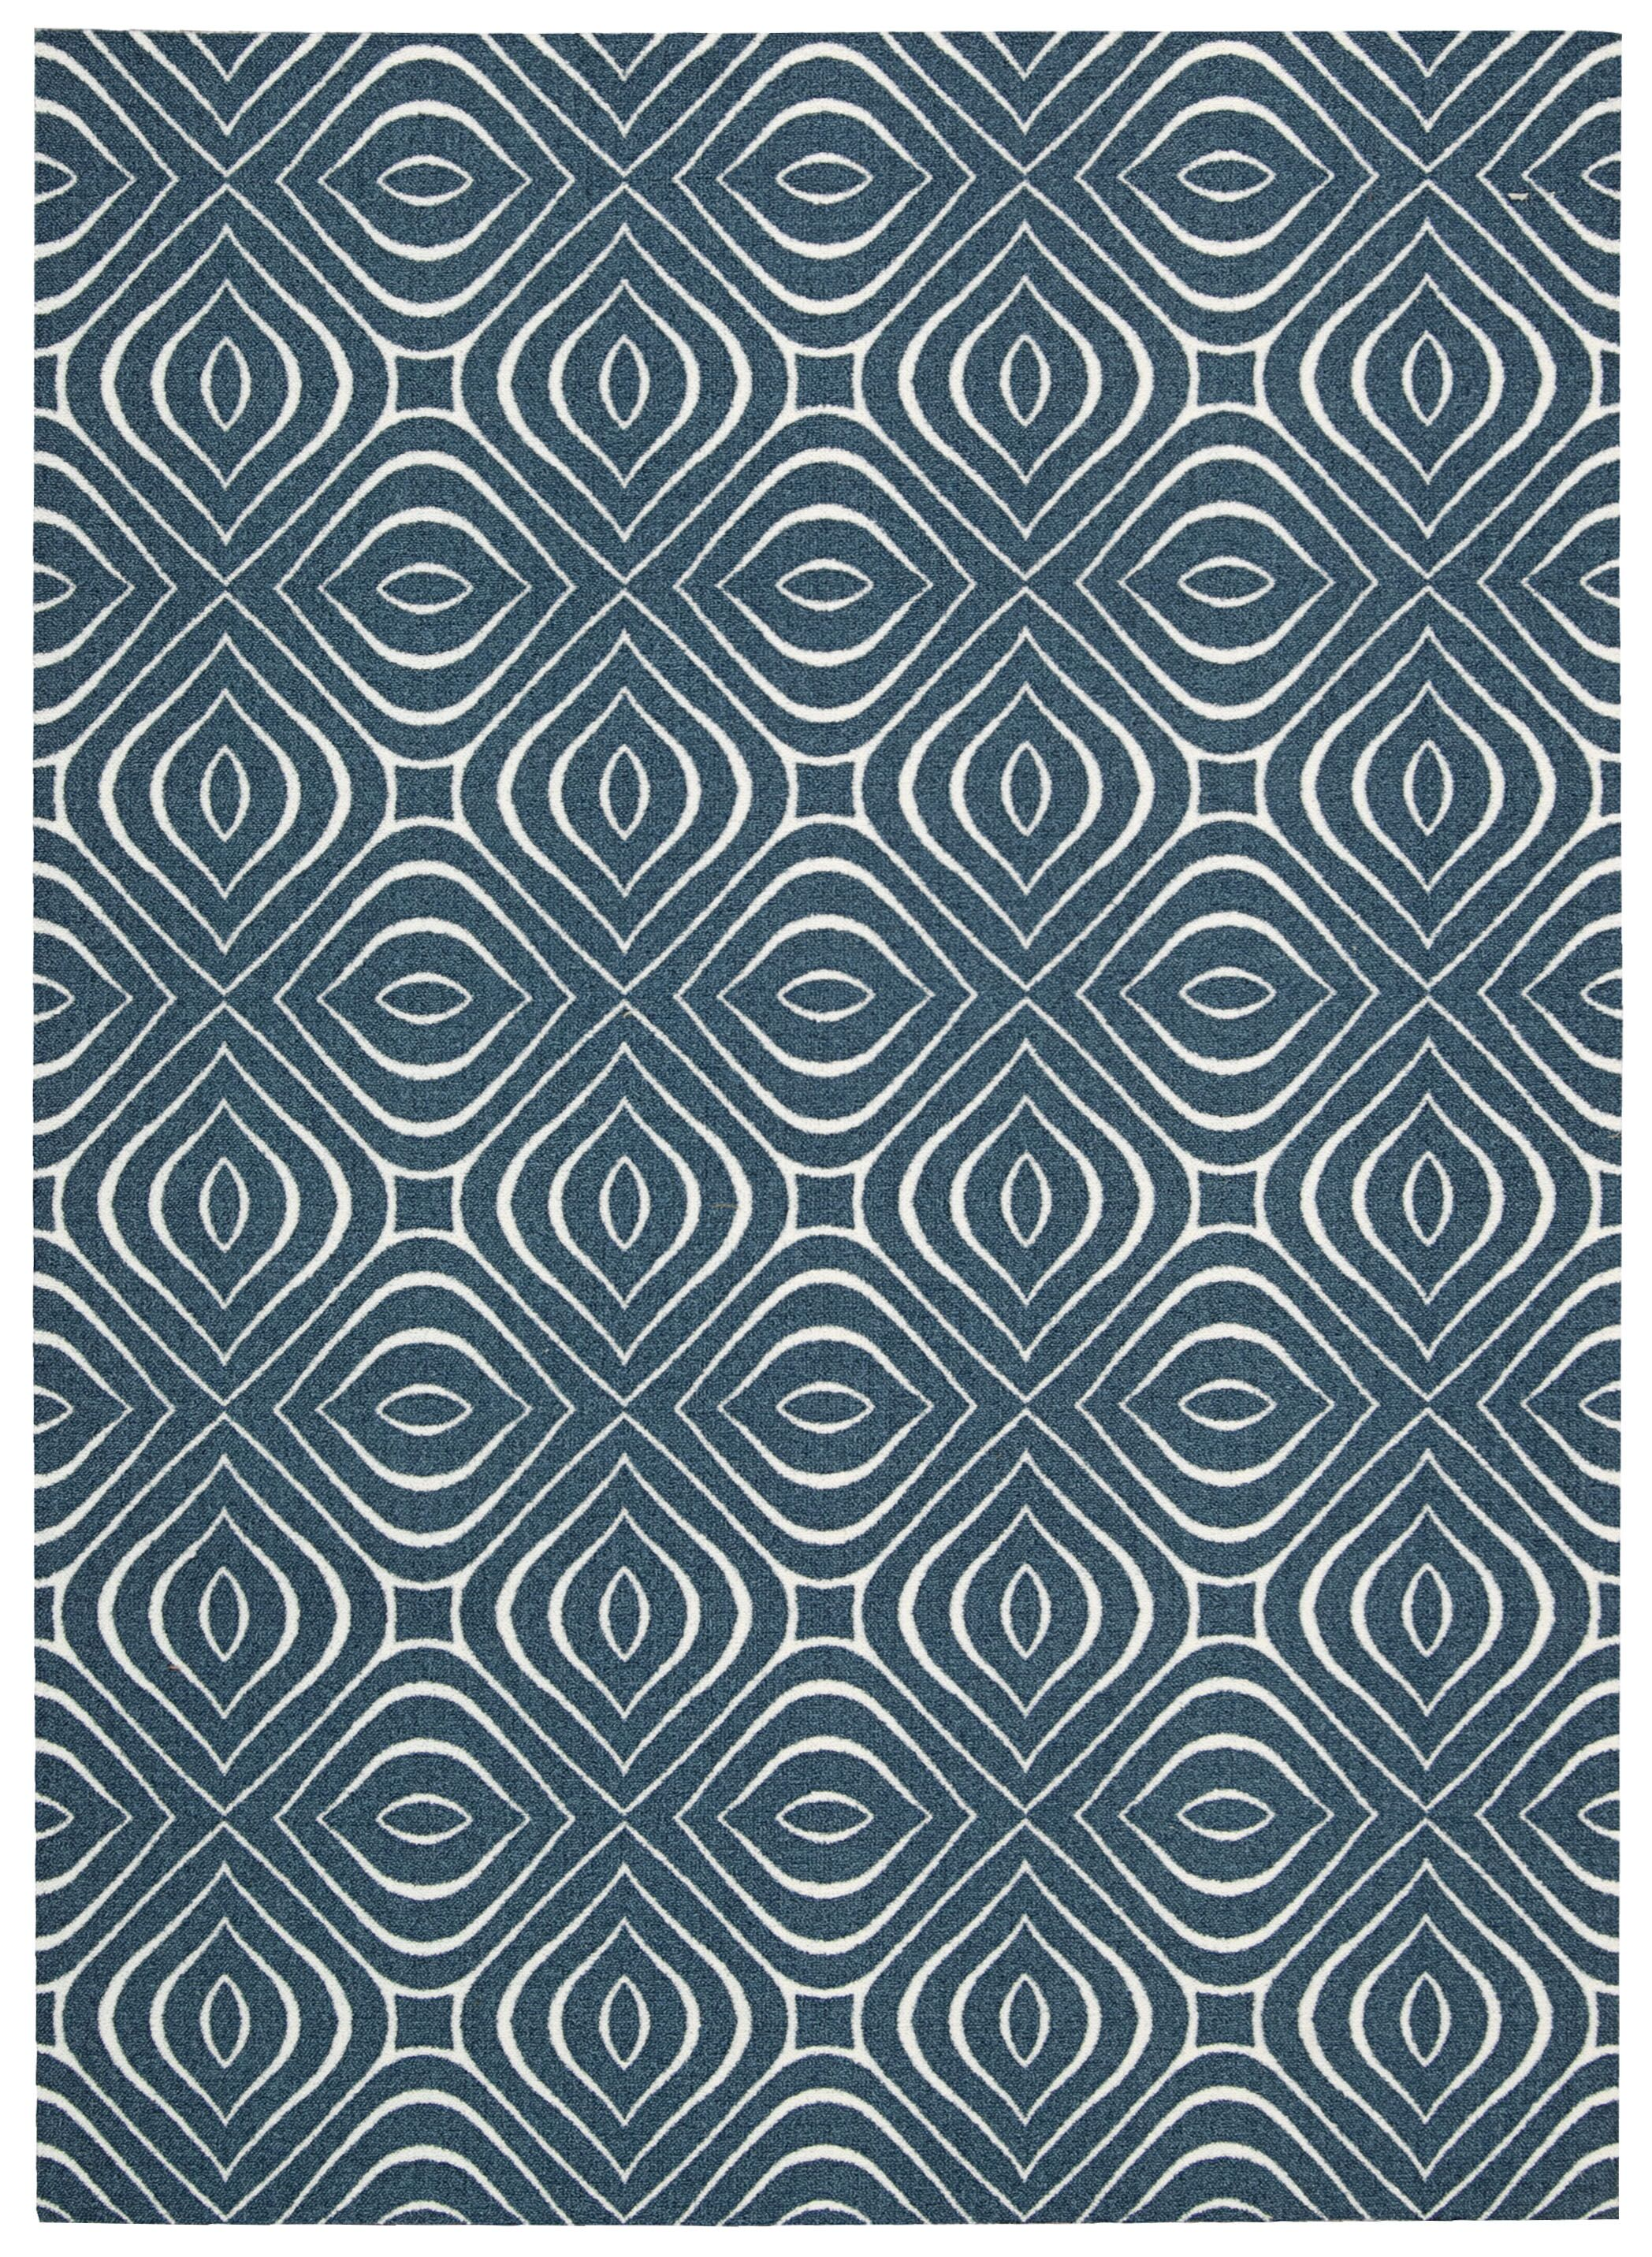 Conforti Cadet  Blue Geometric Area Rug Rug Size: Rectangle 4' x 6'